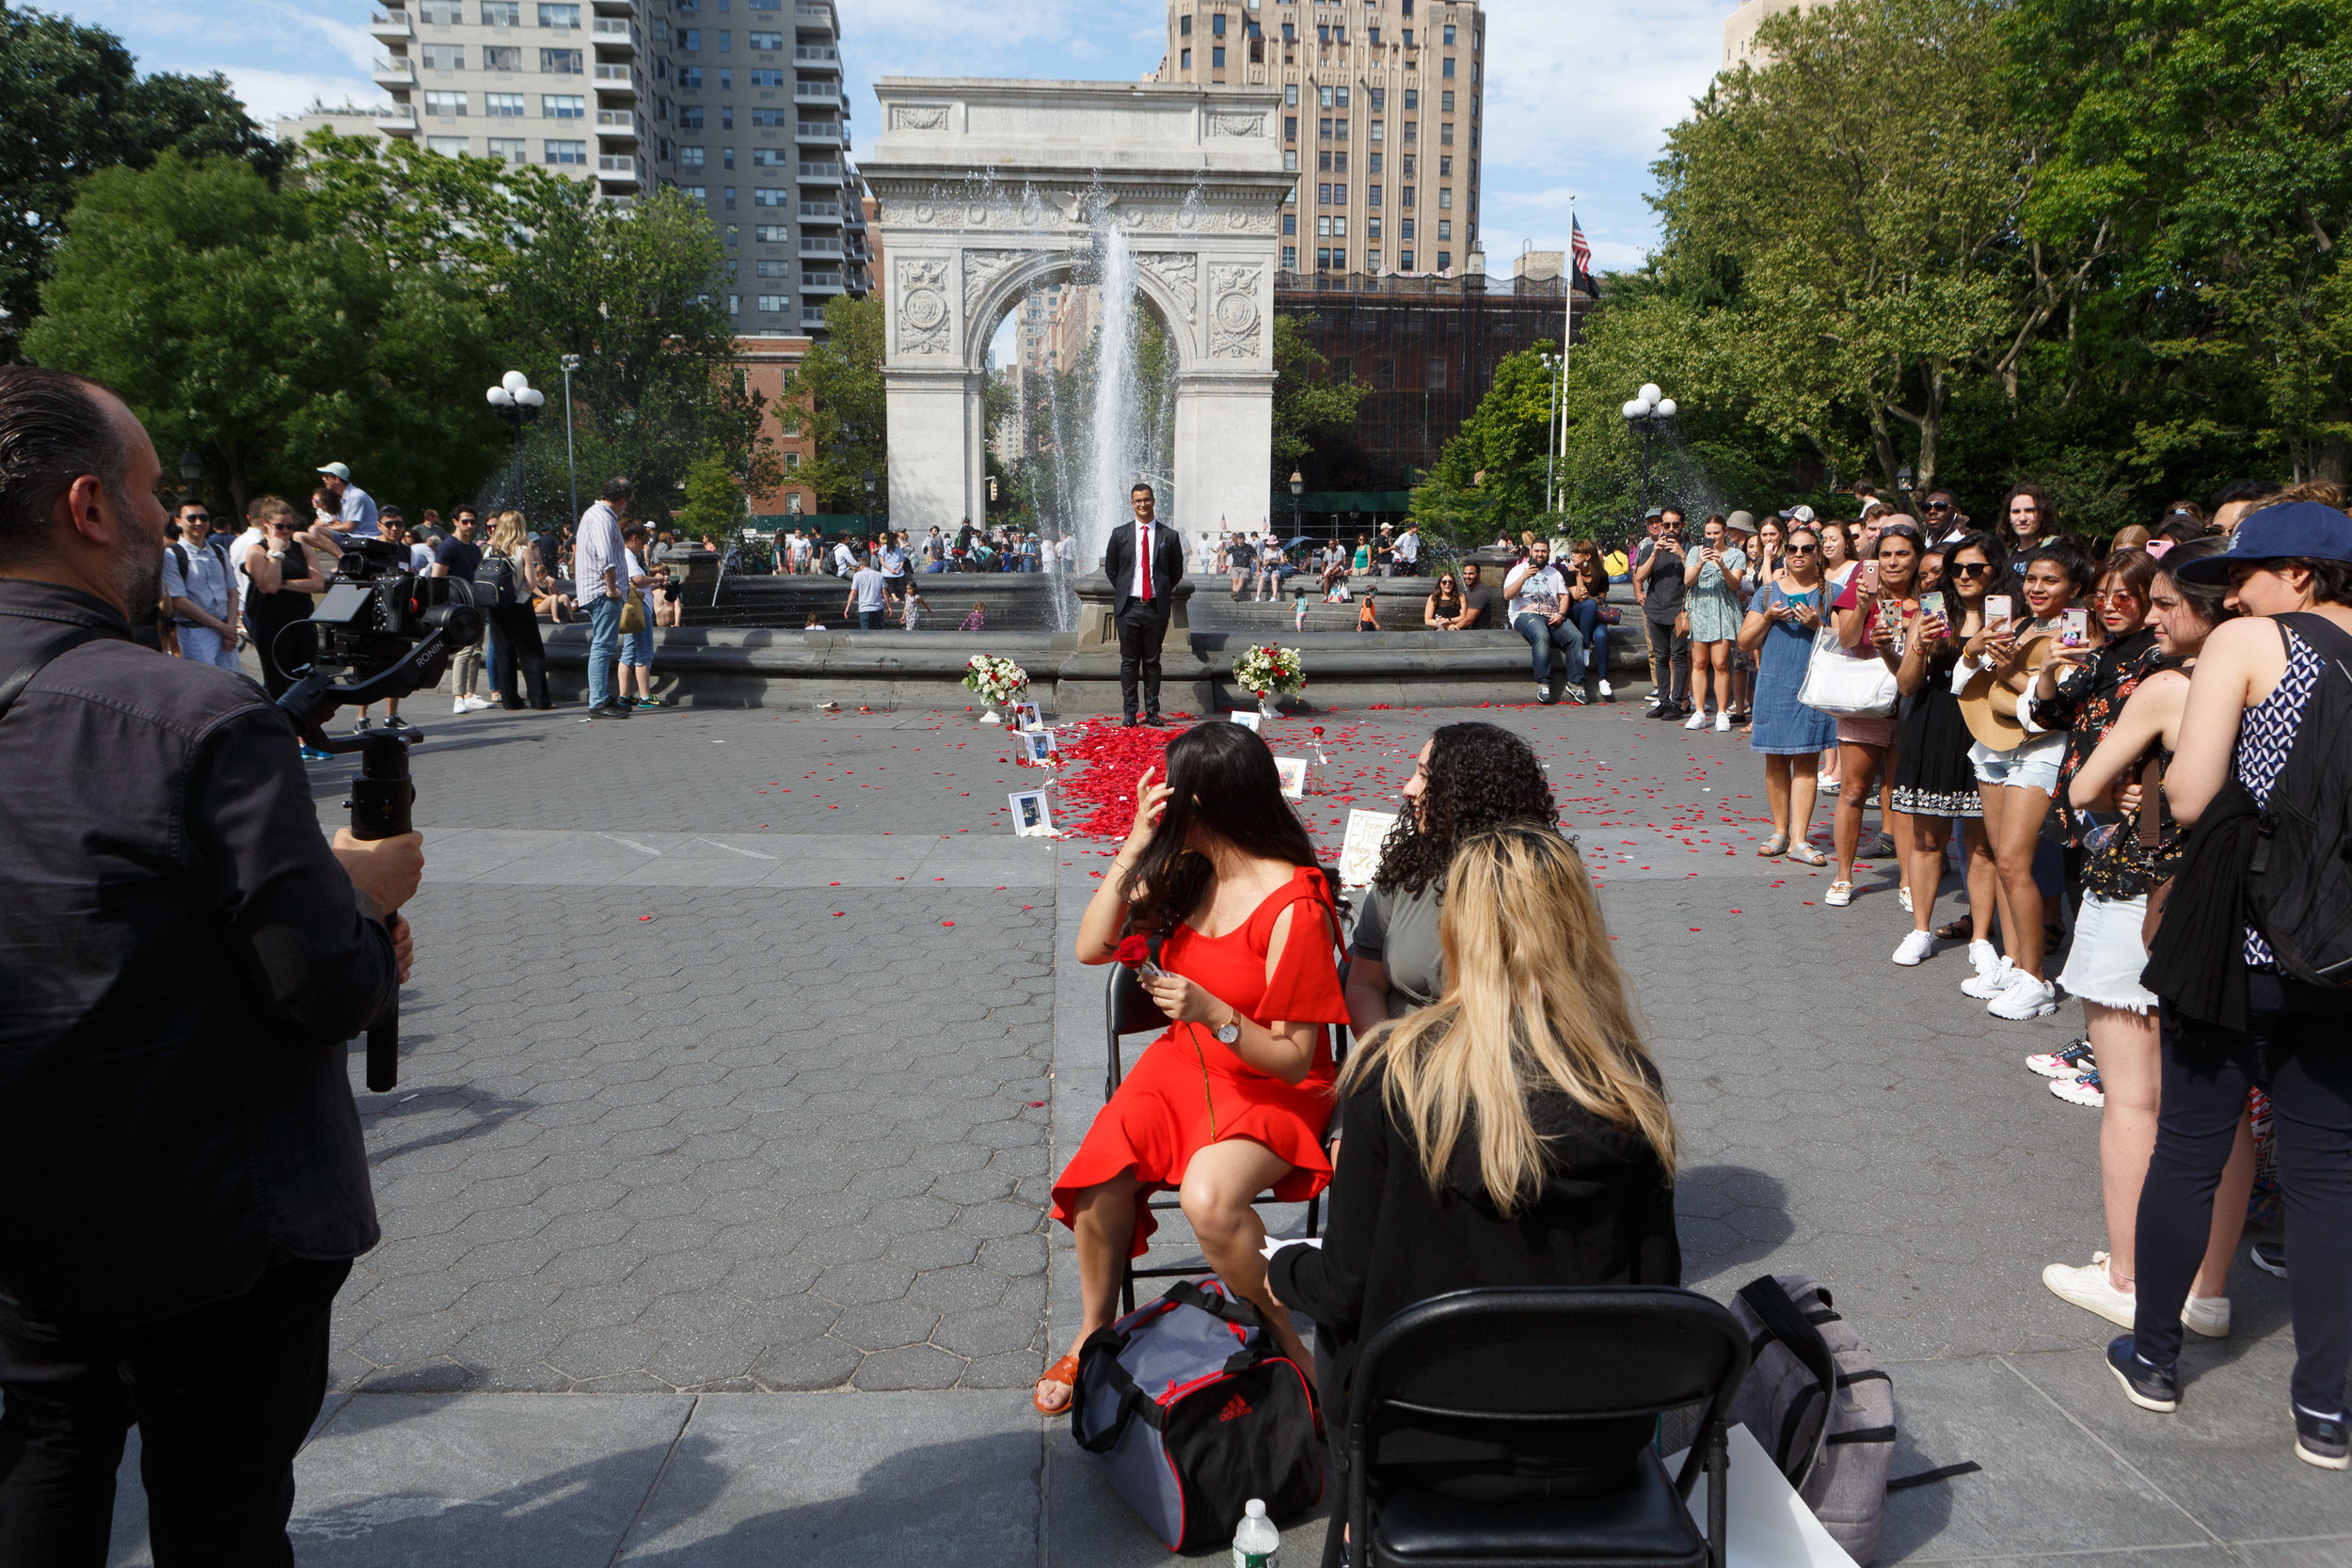 Kiro Rebecca Washington Square Park Marriage Proposal _ Jonathan Heisler _ 6152019 _011.jpg